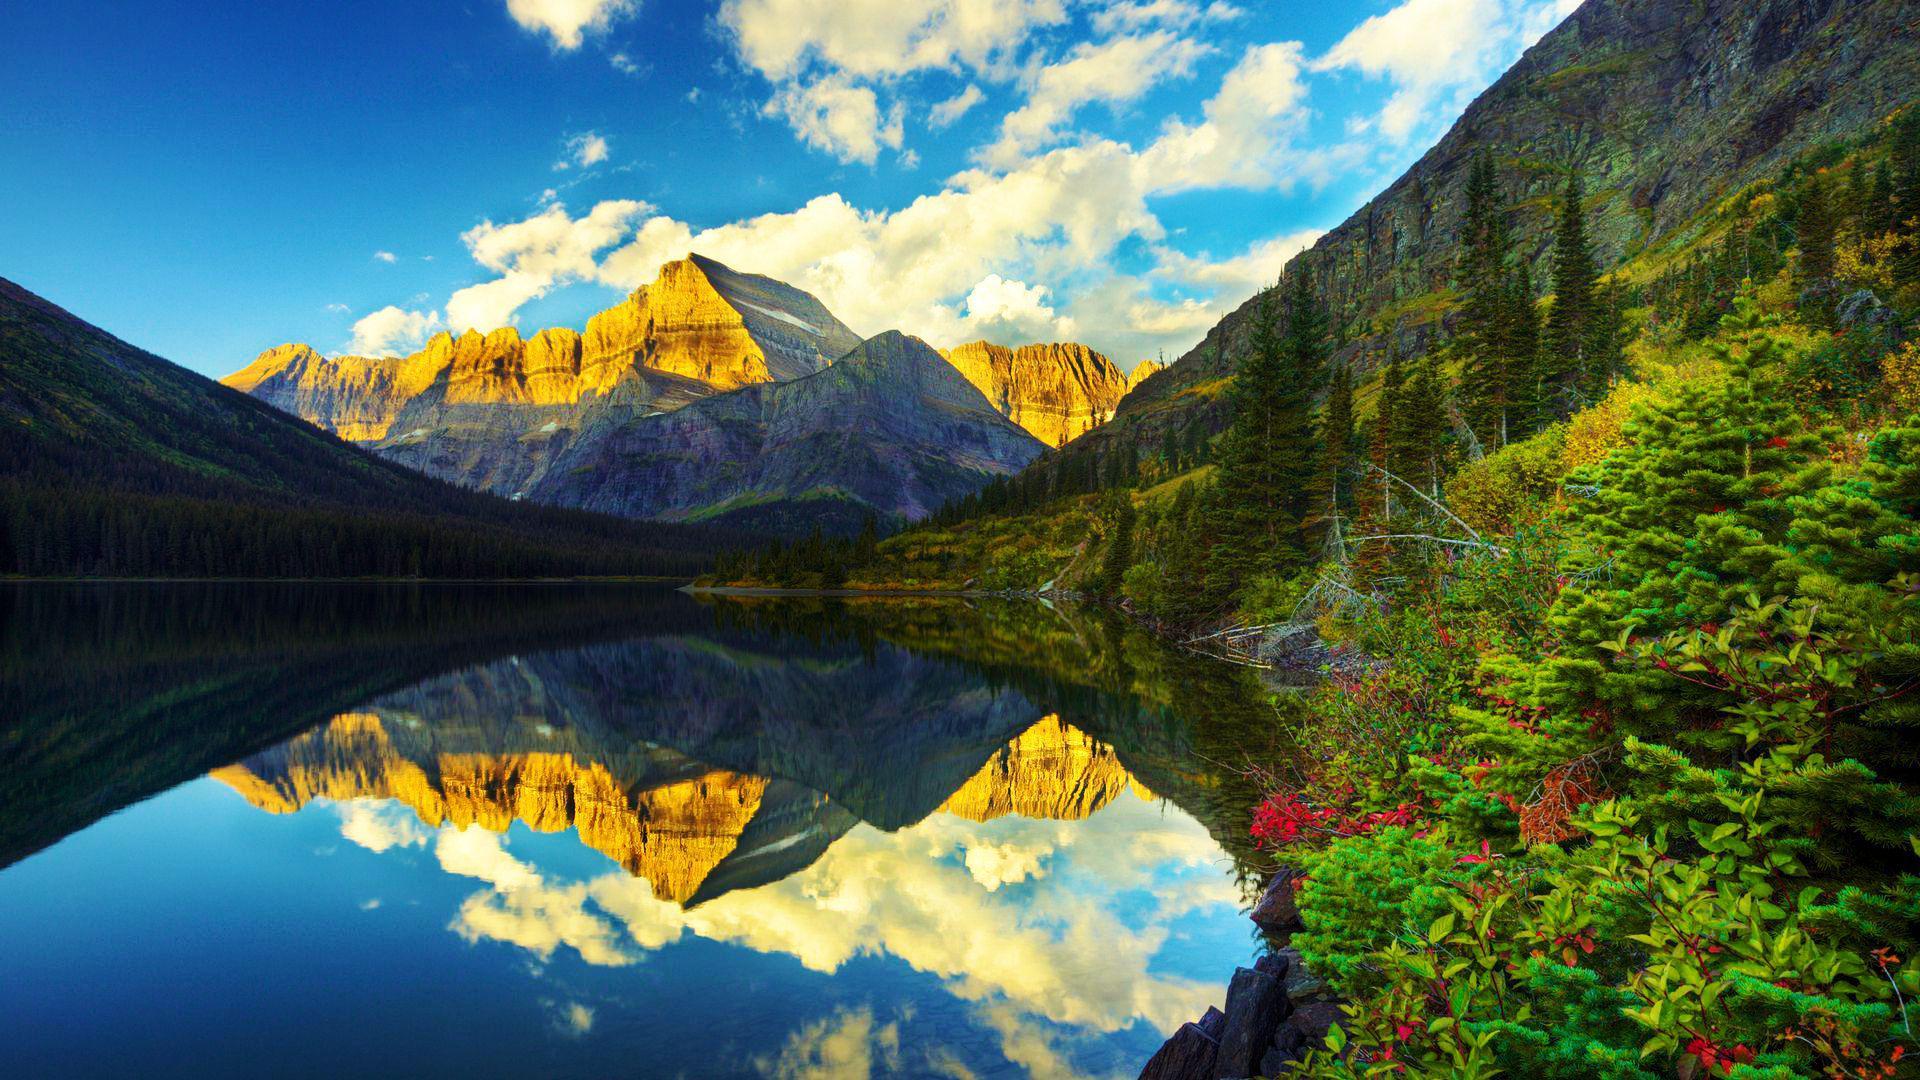 Glacier National Park Desktop Wallpapers   HD Wallpapers Backgrounds 1920x1080